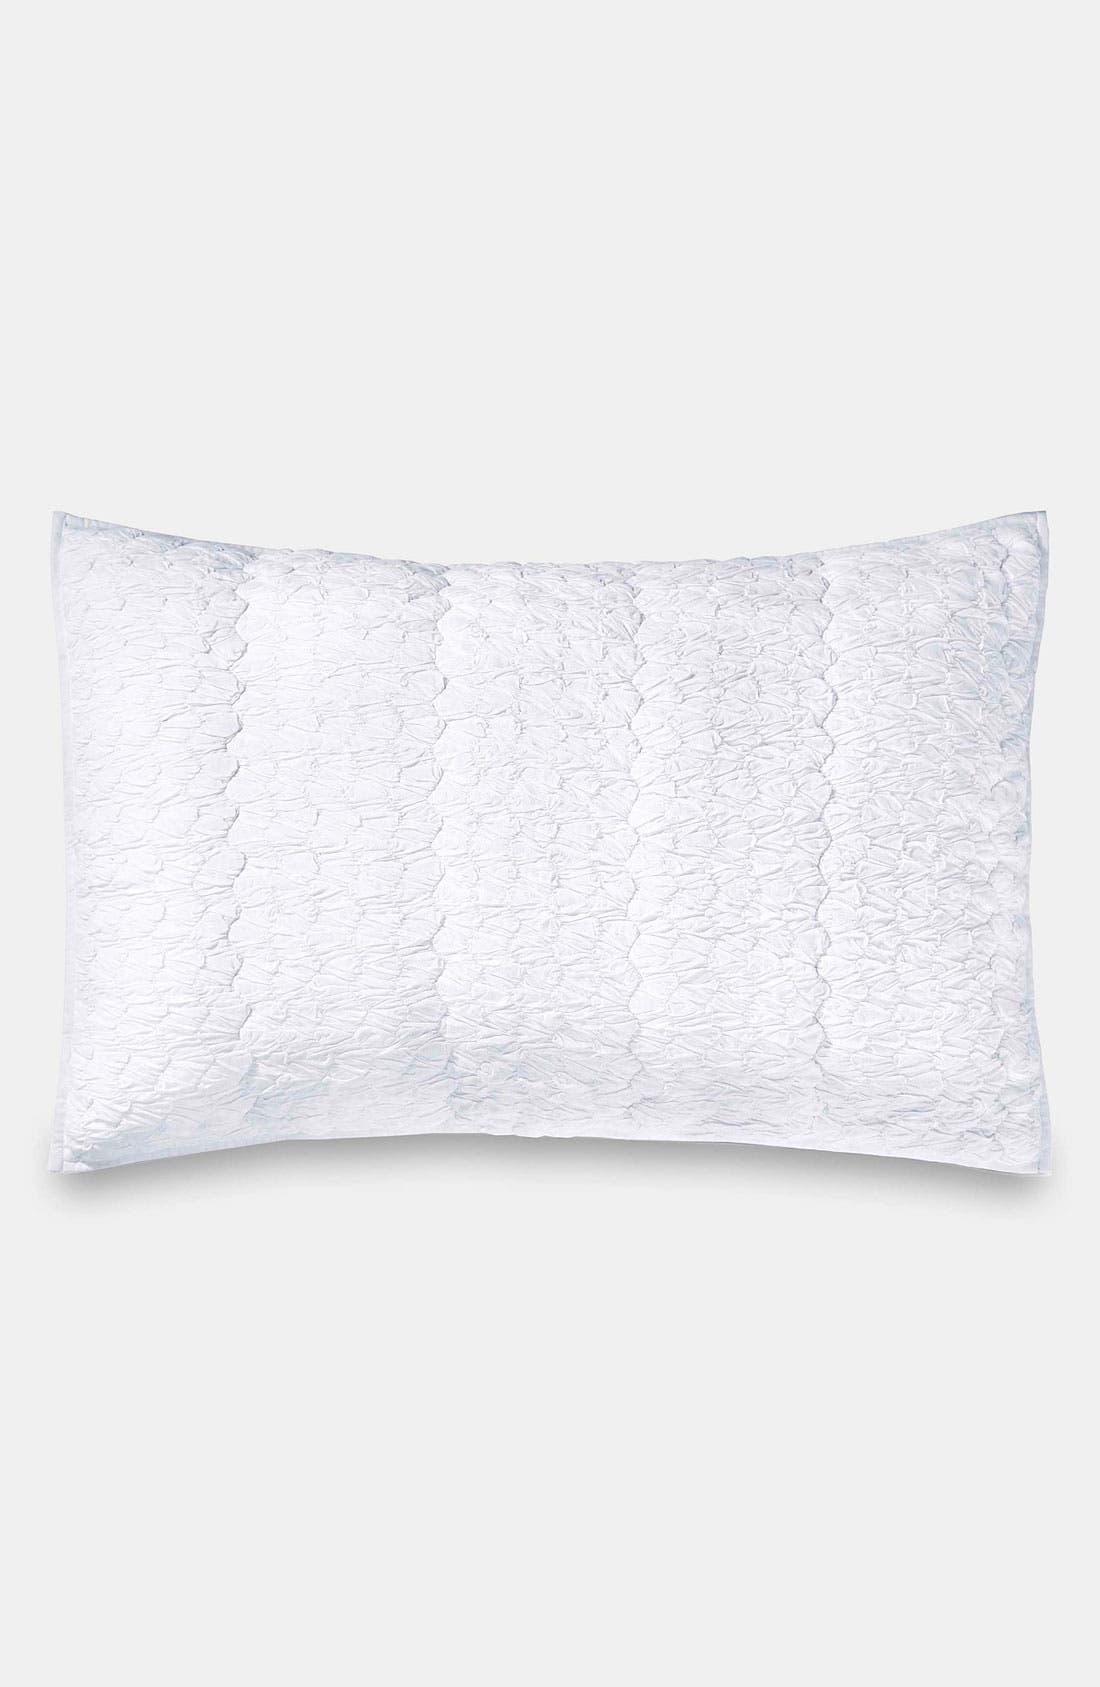 DKNY 'Pure Enchantment' Pillow Sham